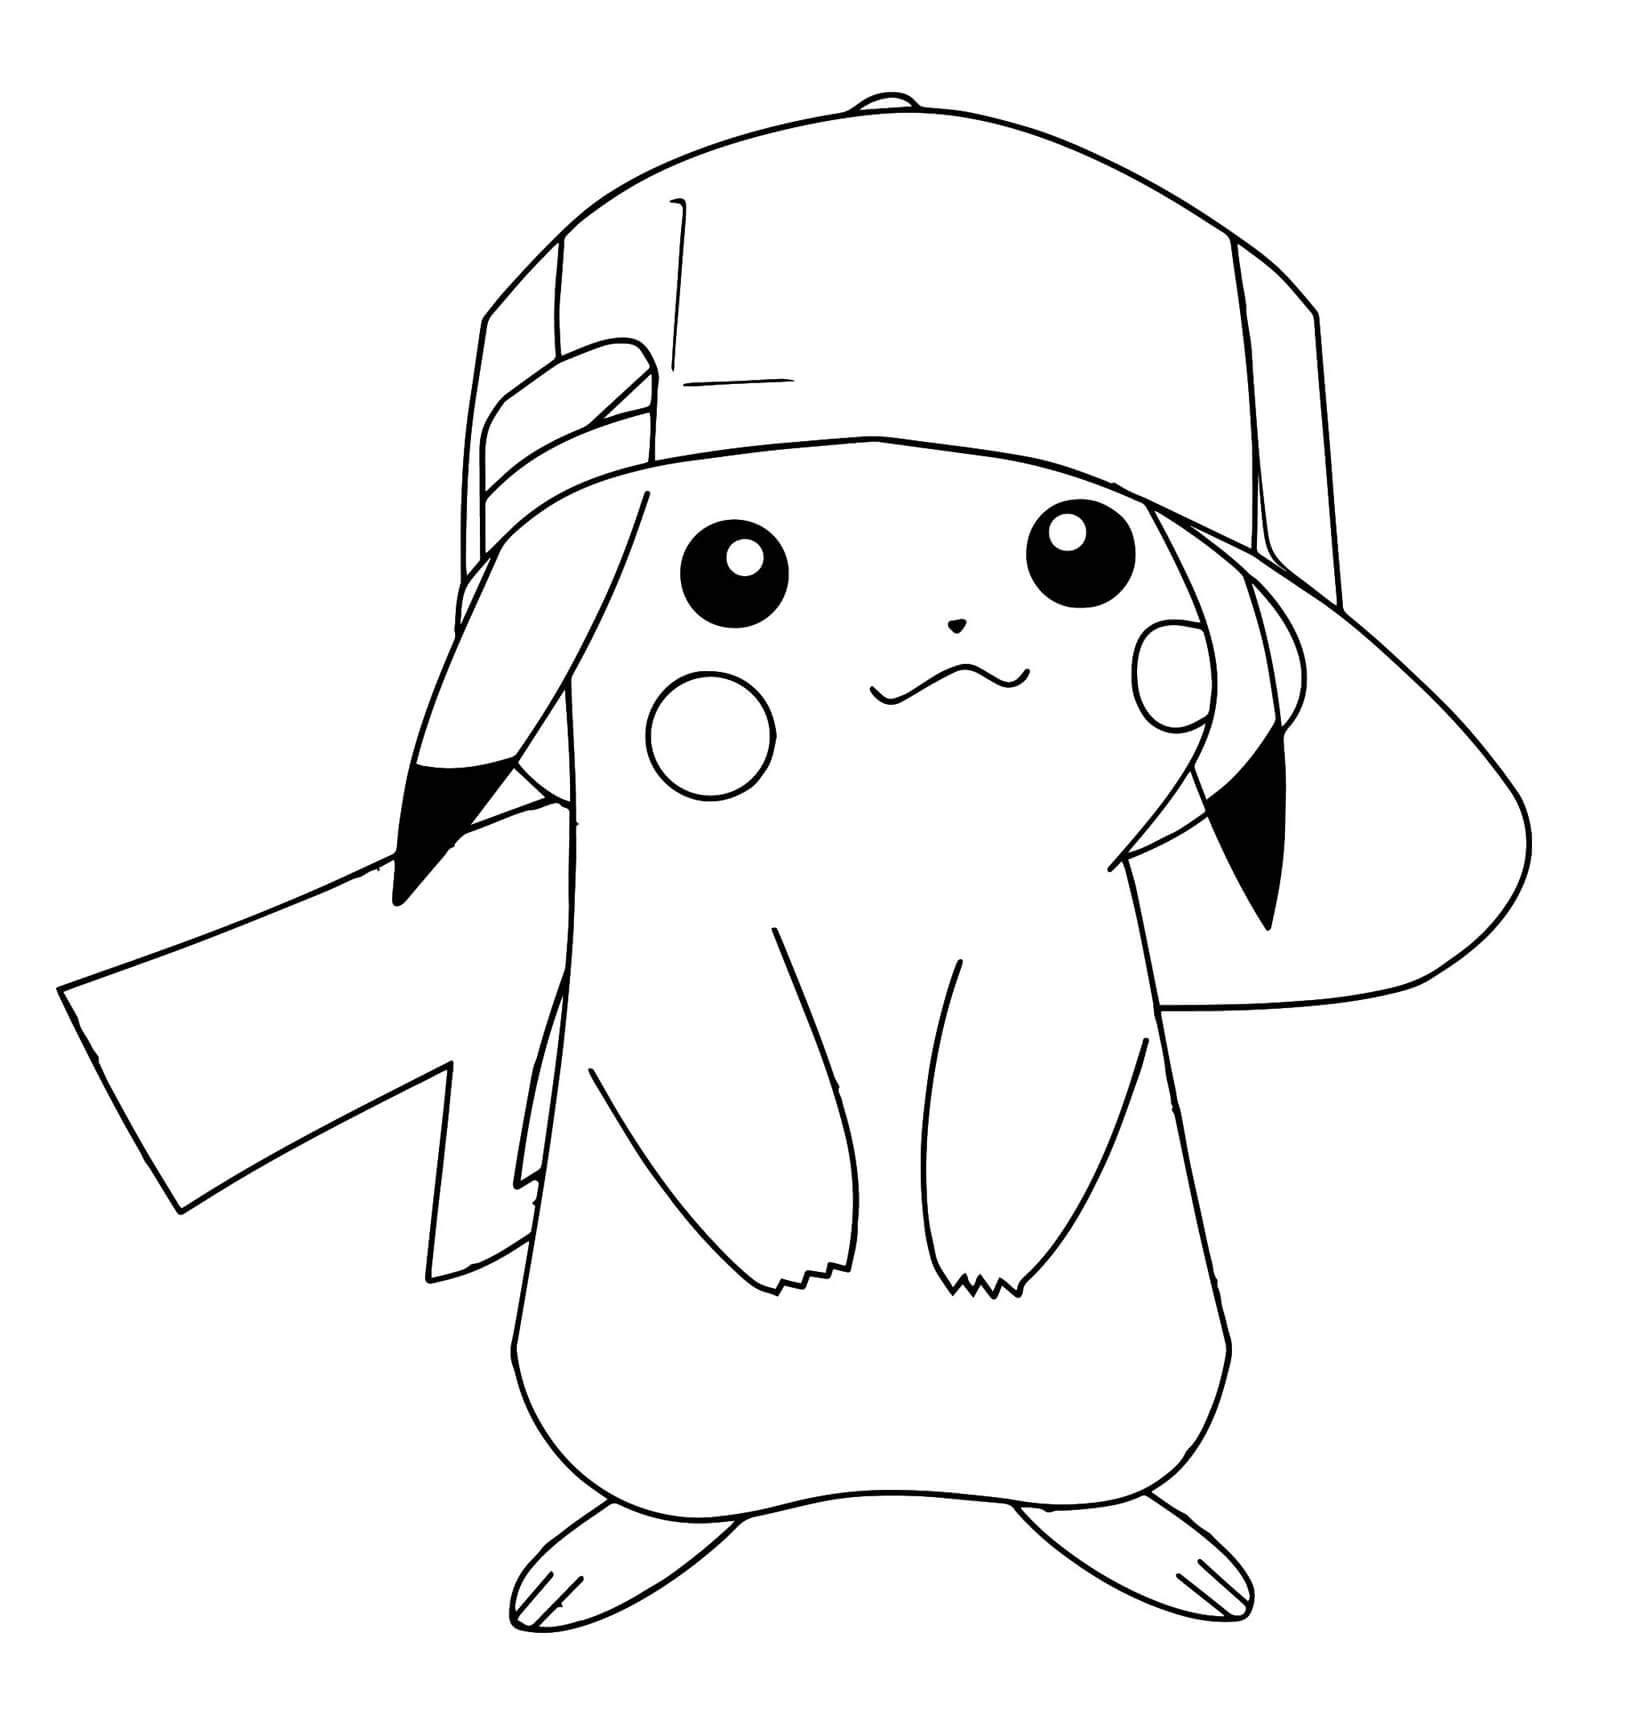 Pikachu-Ausmalbilderjpg (1646×1725) pikachu Pinterest